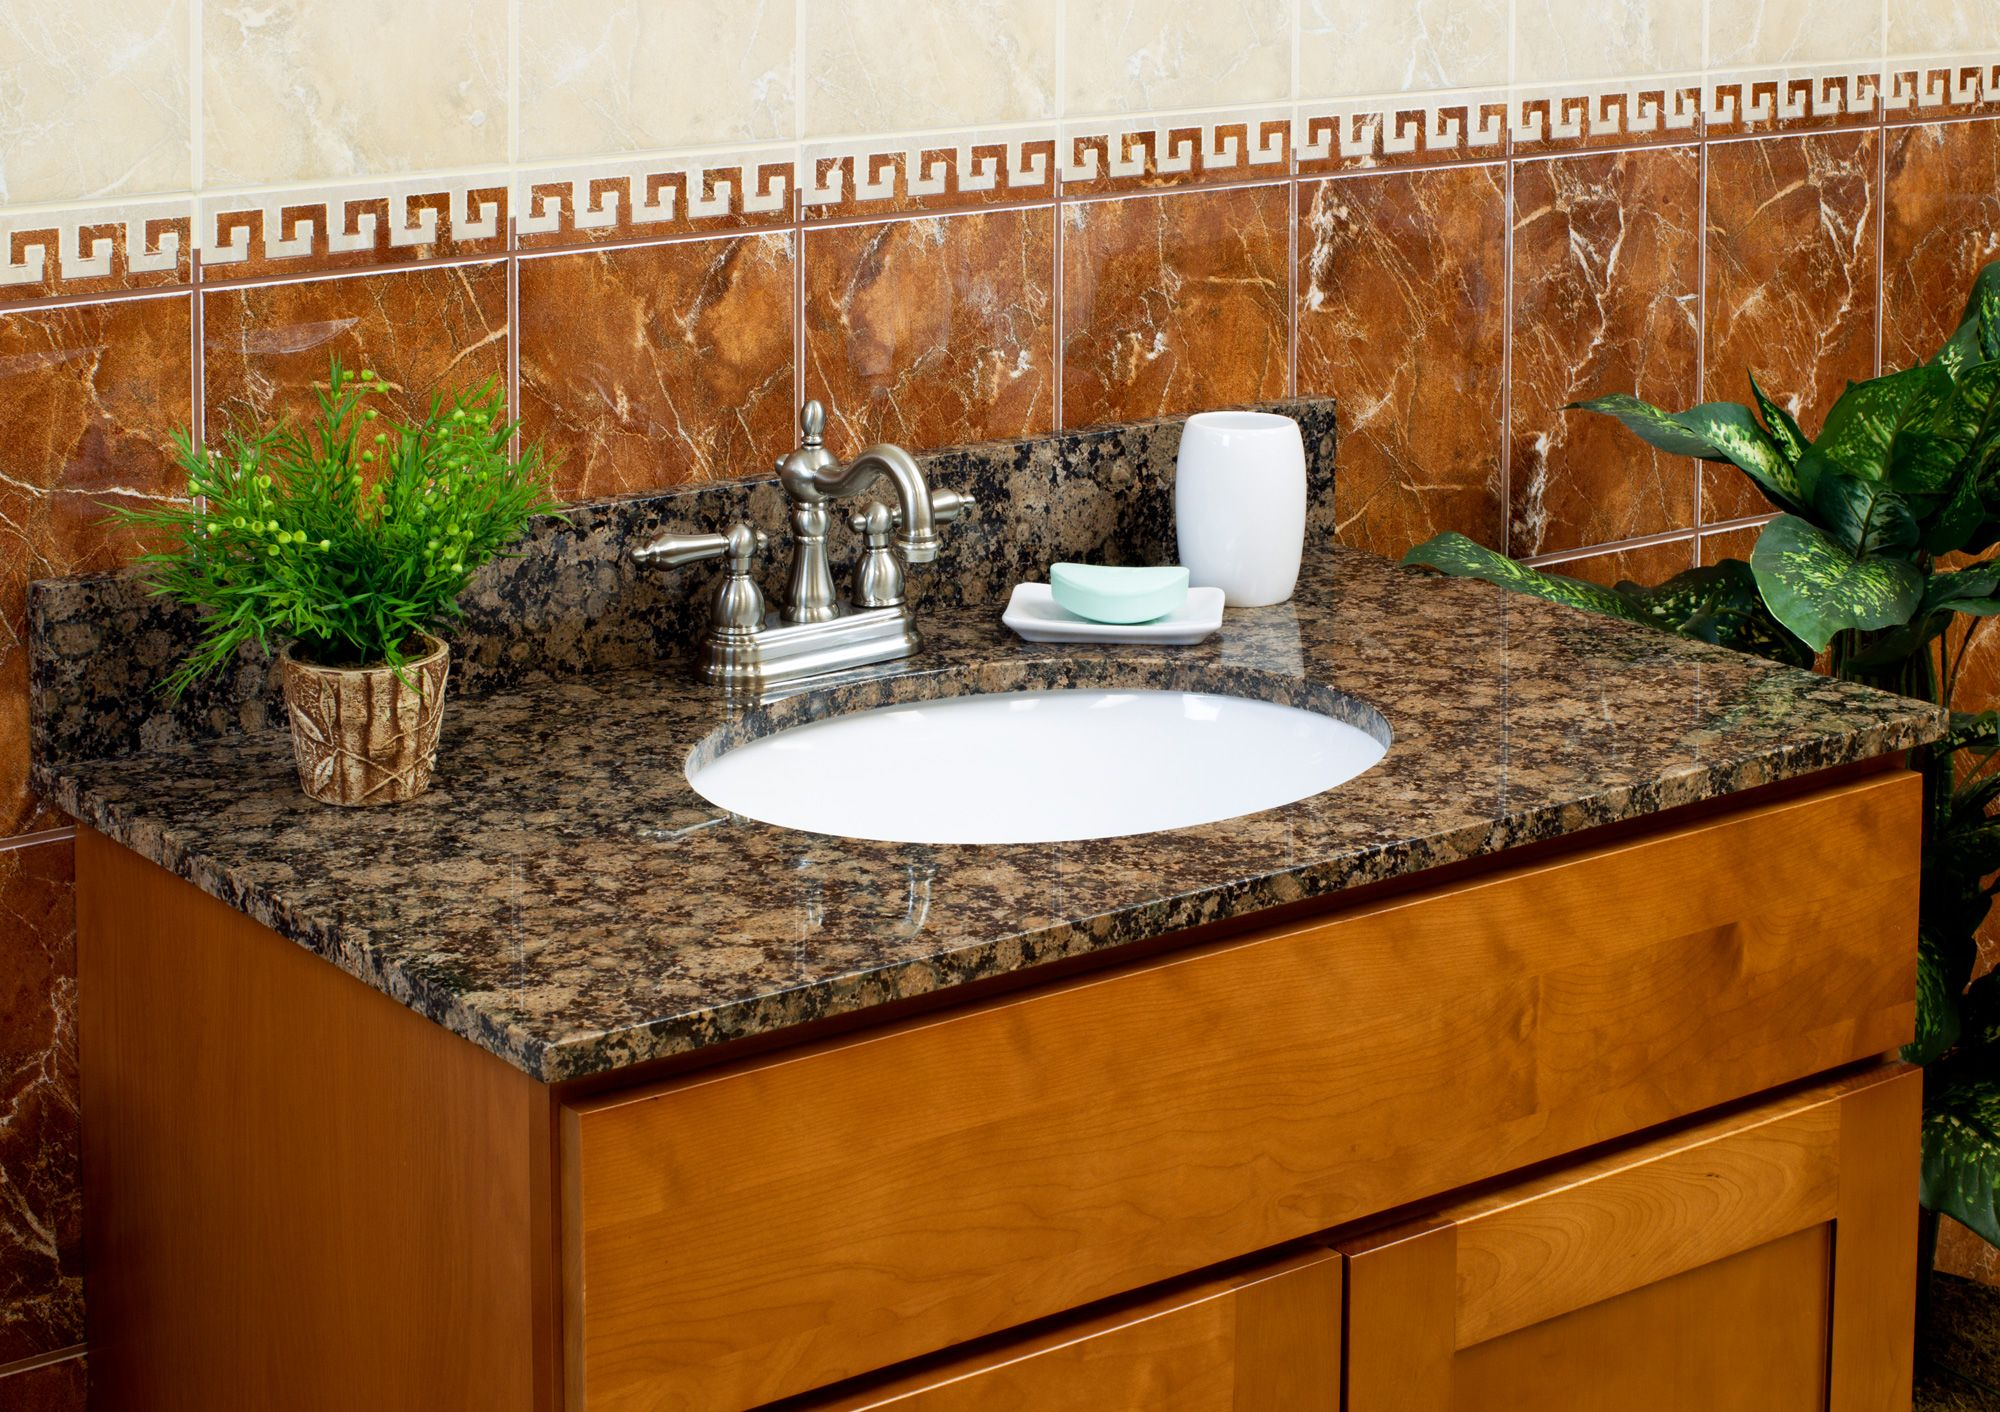 High Quality 36 Bathroom Vanity Cabinet With Granite Top Sink